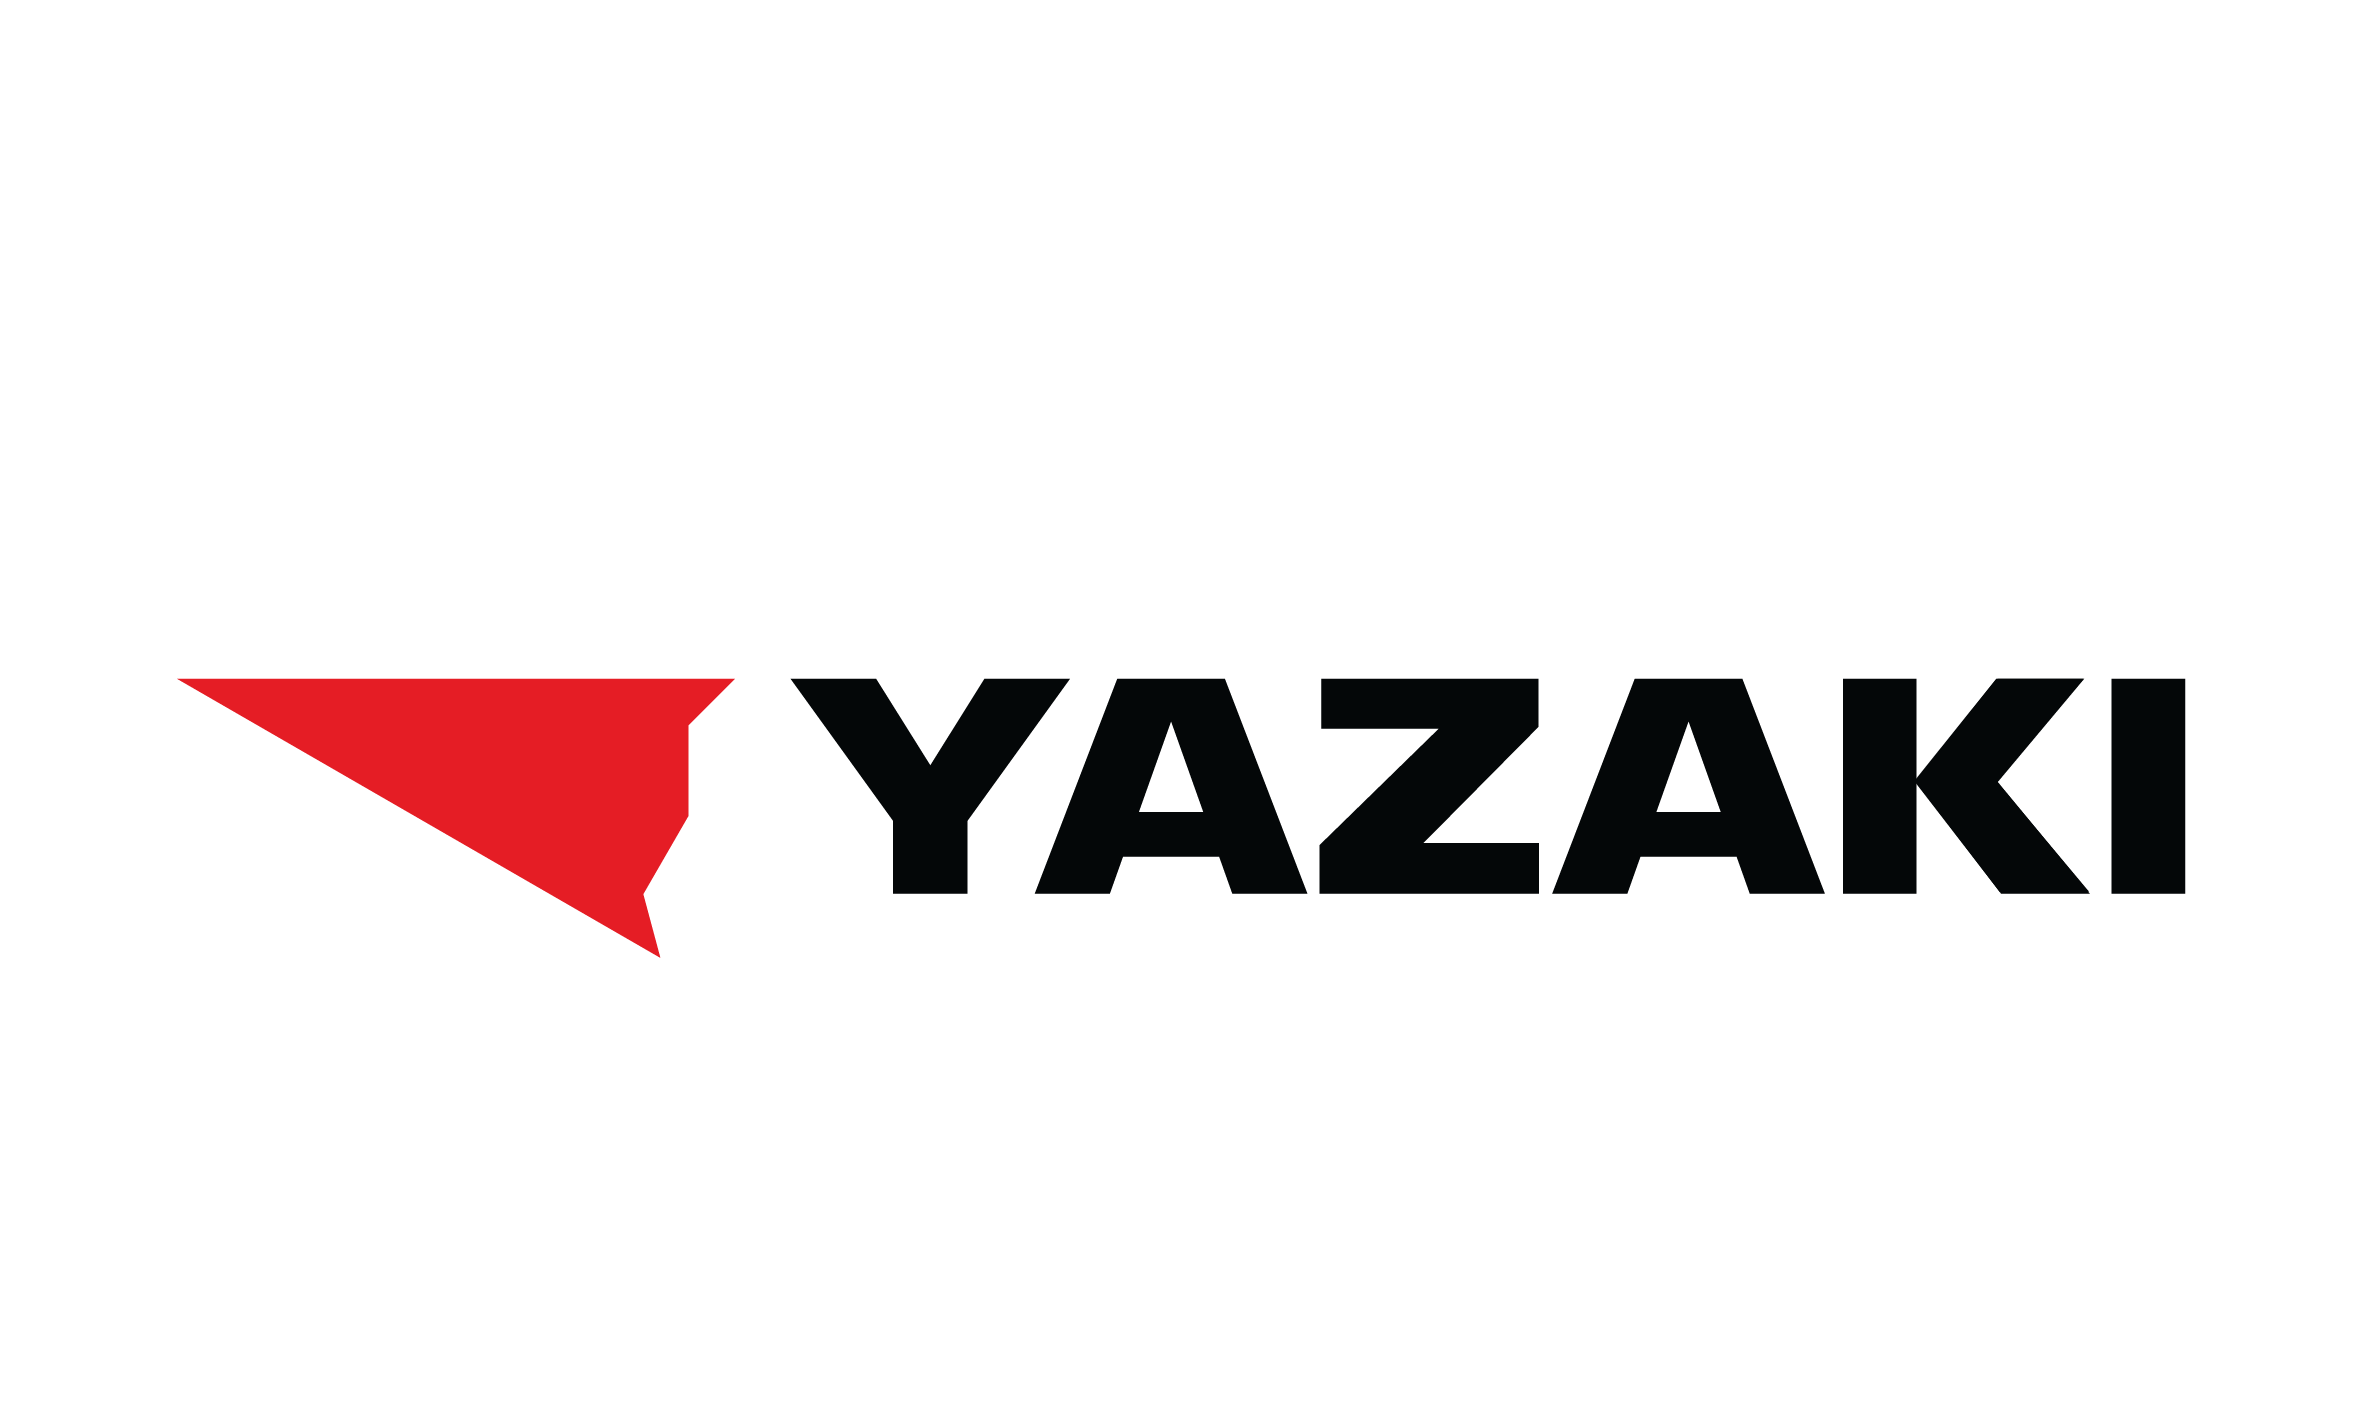 yazaki wiring technologies free economic zone in klaip da rh fez lt yazaki wiring technologies lietuva yazaki wiring technologies czech s.r.o